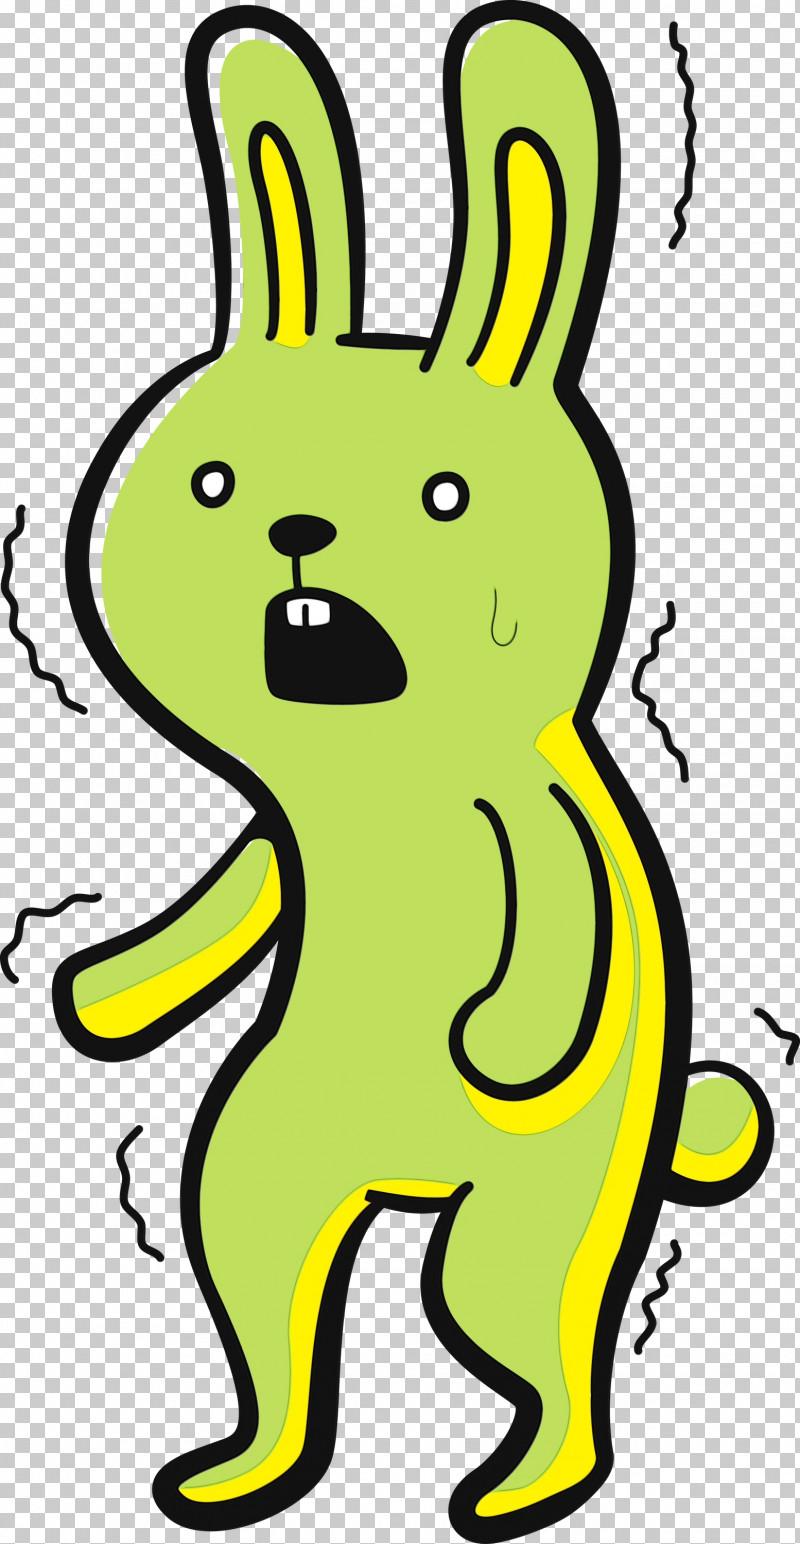 Cartoon Yellow Animal Figurine Rabbit Meter PNG, Clipart, Animal Figurine, Biology, Cartoon, Cartoon Rabbit, Cute Rabbit Free PNG Download